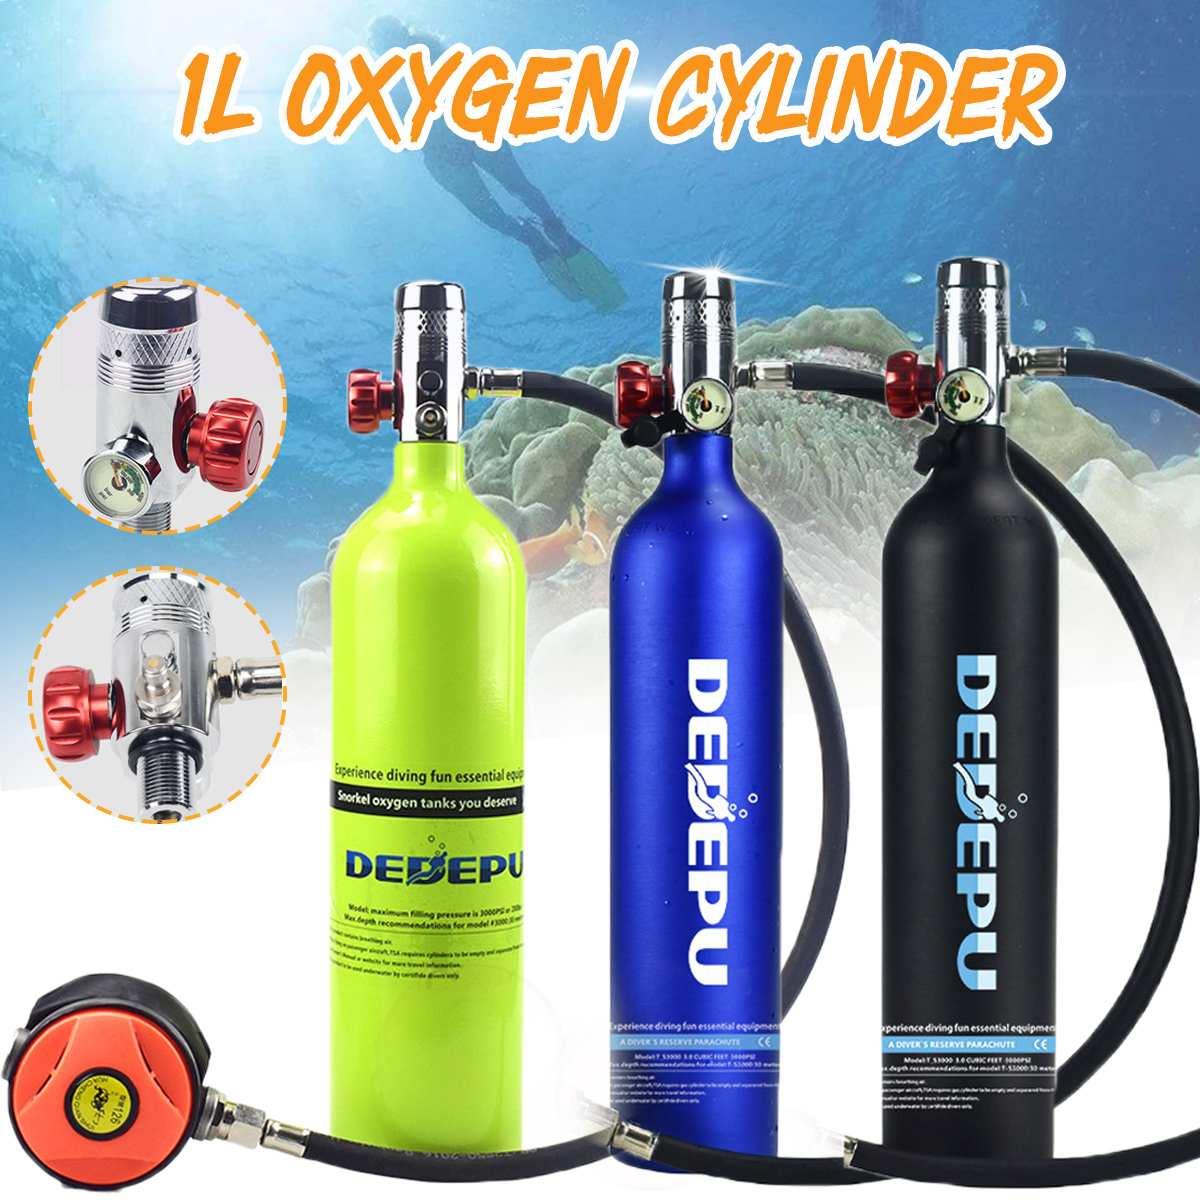 Equipo de Buceo 1L, cilindro de buceo, tanque de oxígeno, respirador, adaptador de repuesto, bomba de alta presión, accesorios de respiración de buceo - 2